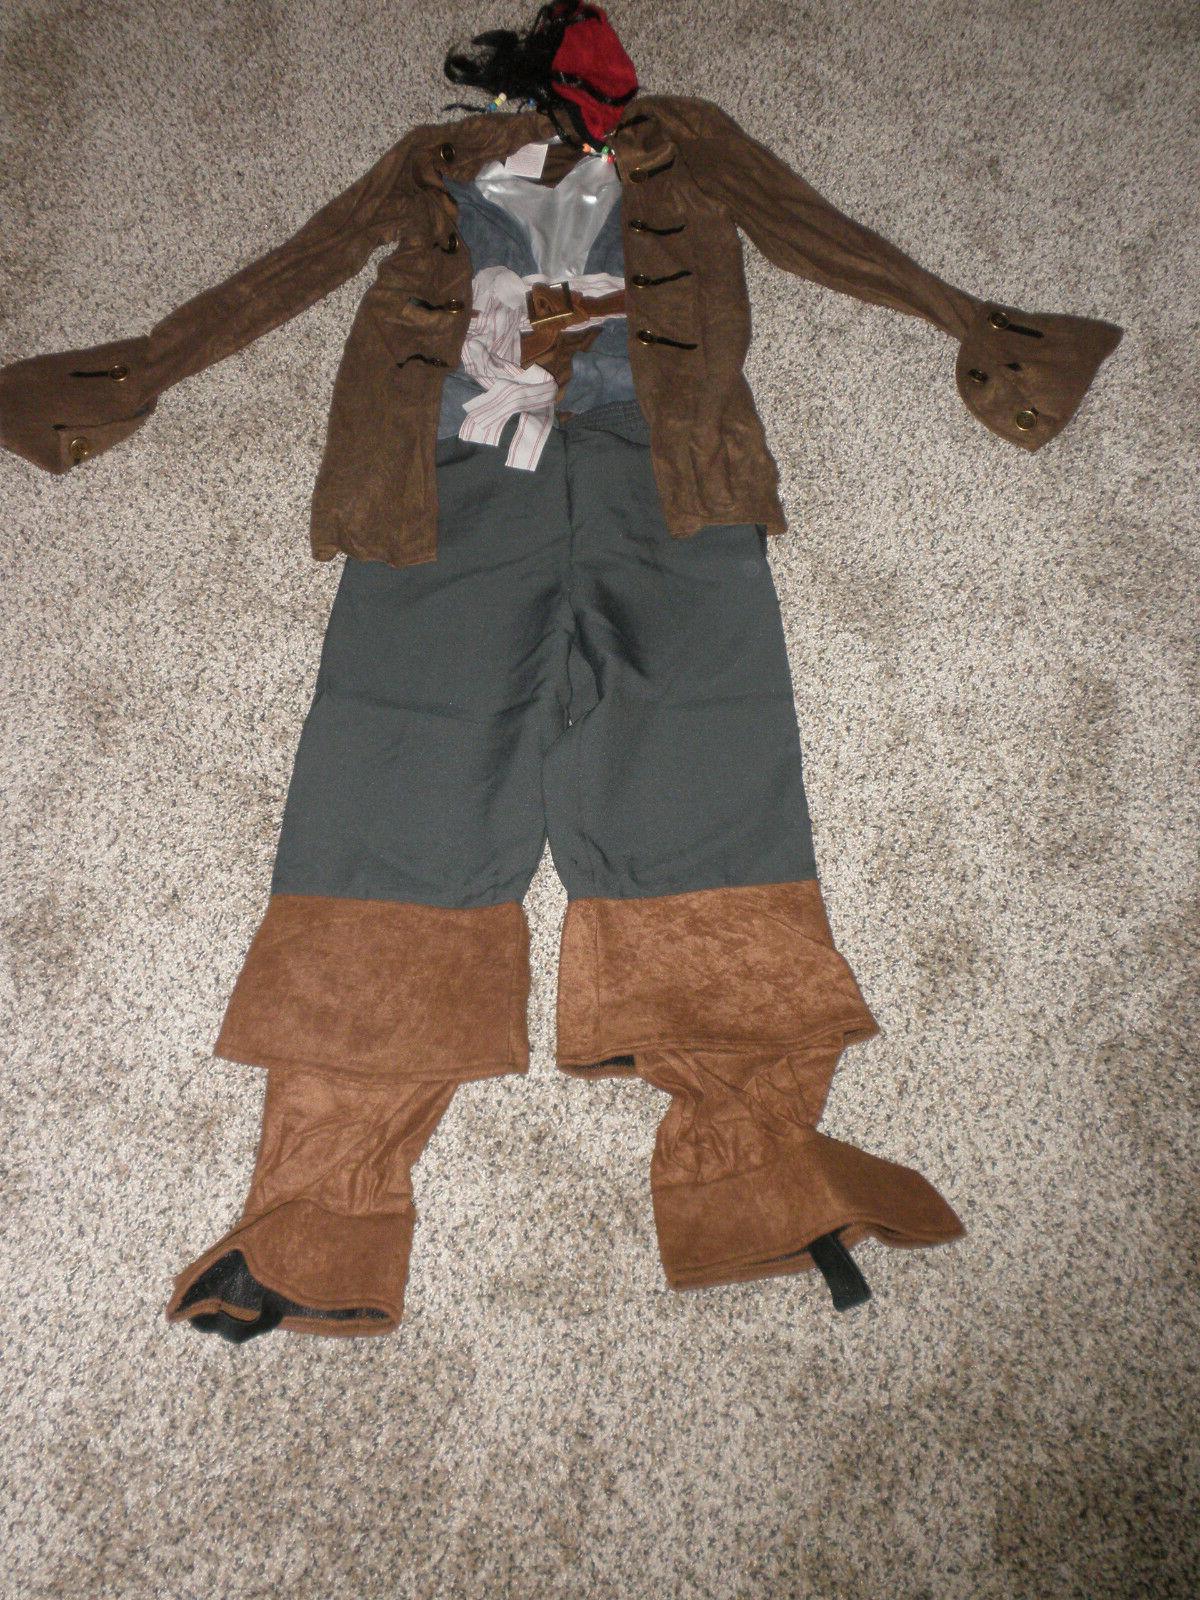 Disney Store Jack Sparrow Pirate Costume childs Medium 7/8